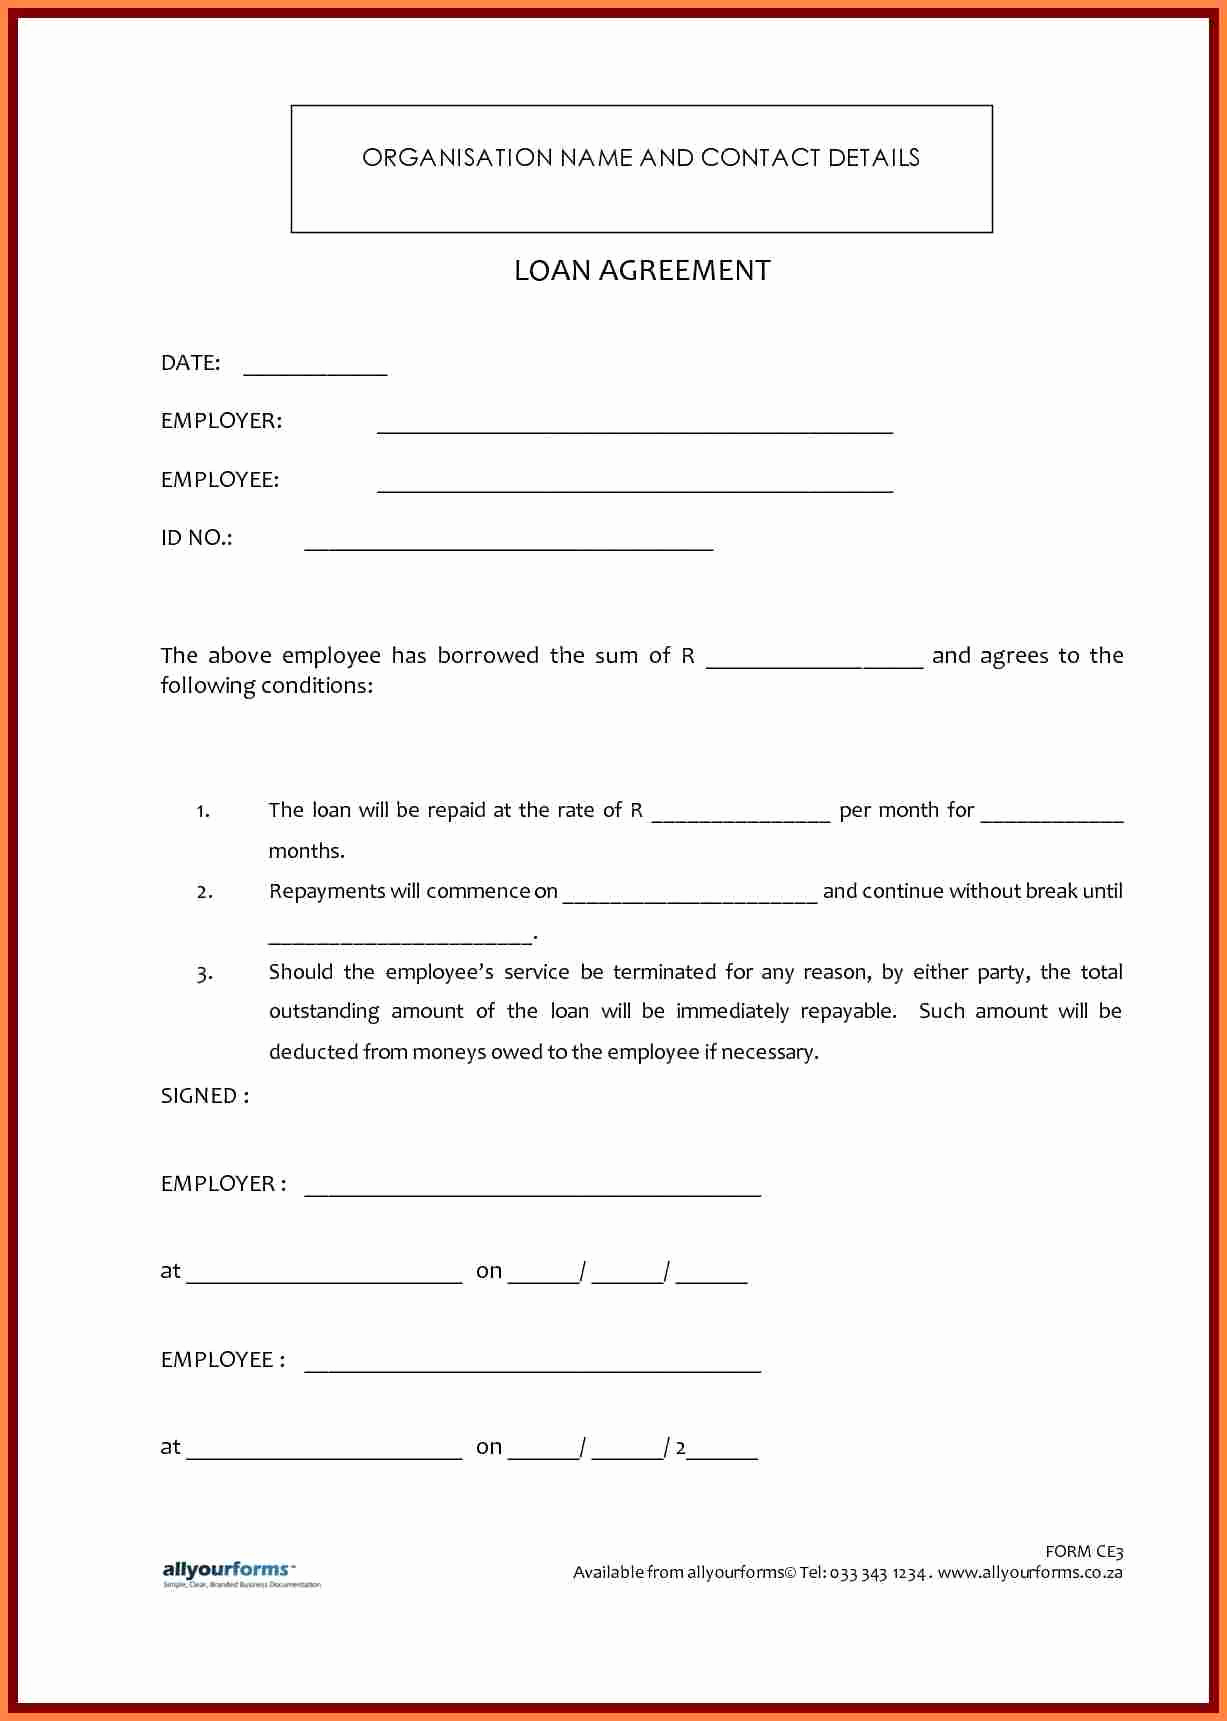 Personal Loan Agreement Template Elegant 7 Template Loan Agreement Between Family Members